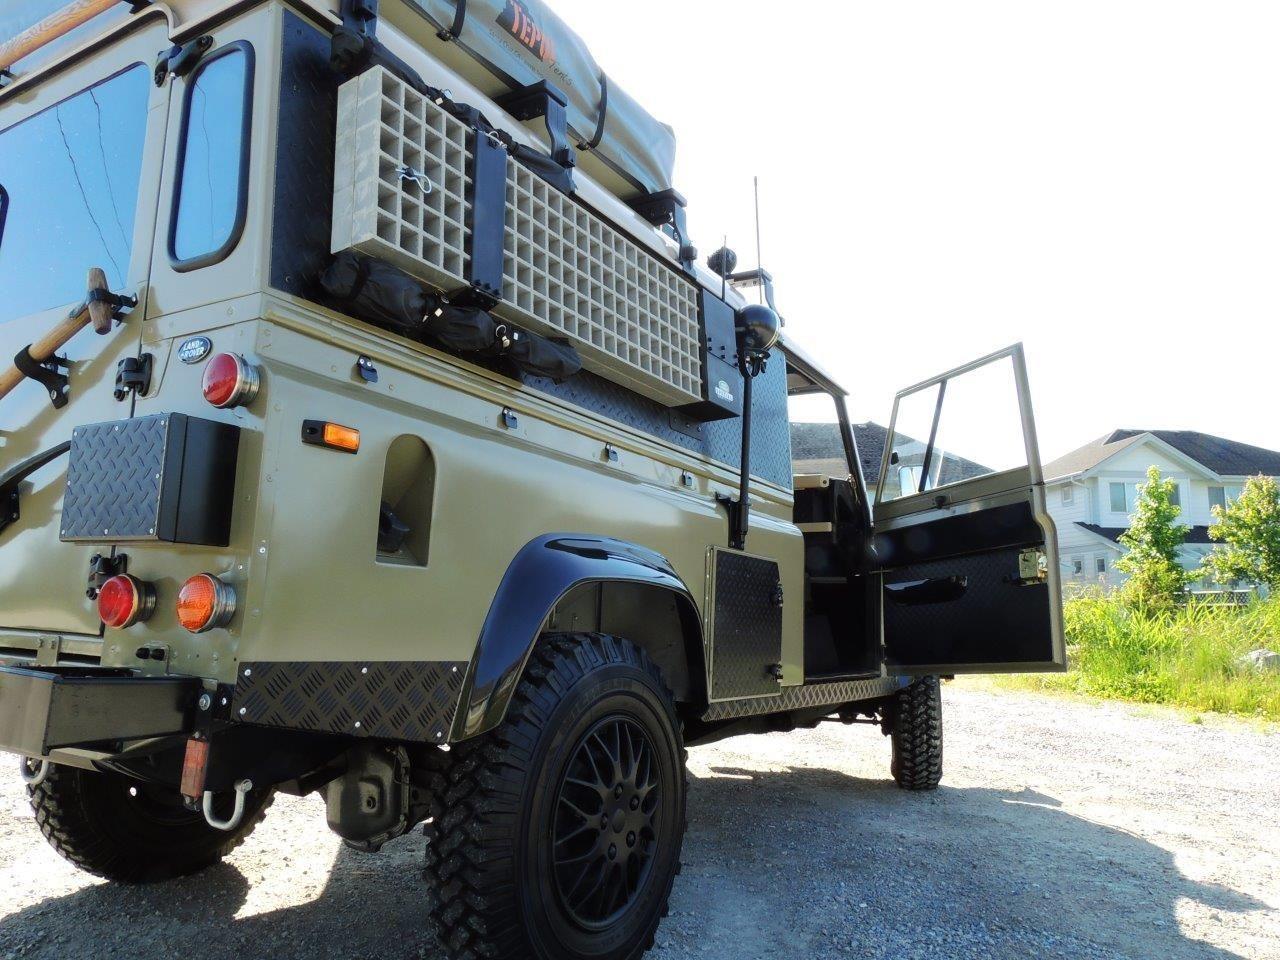 1990 Land Rover Defender 110 Expedition Overland